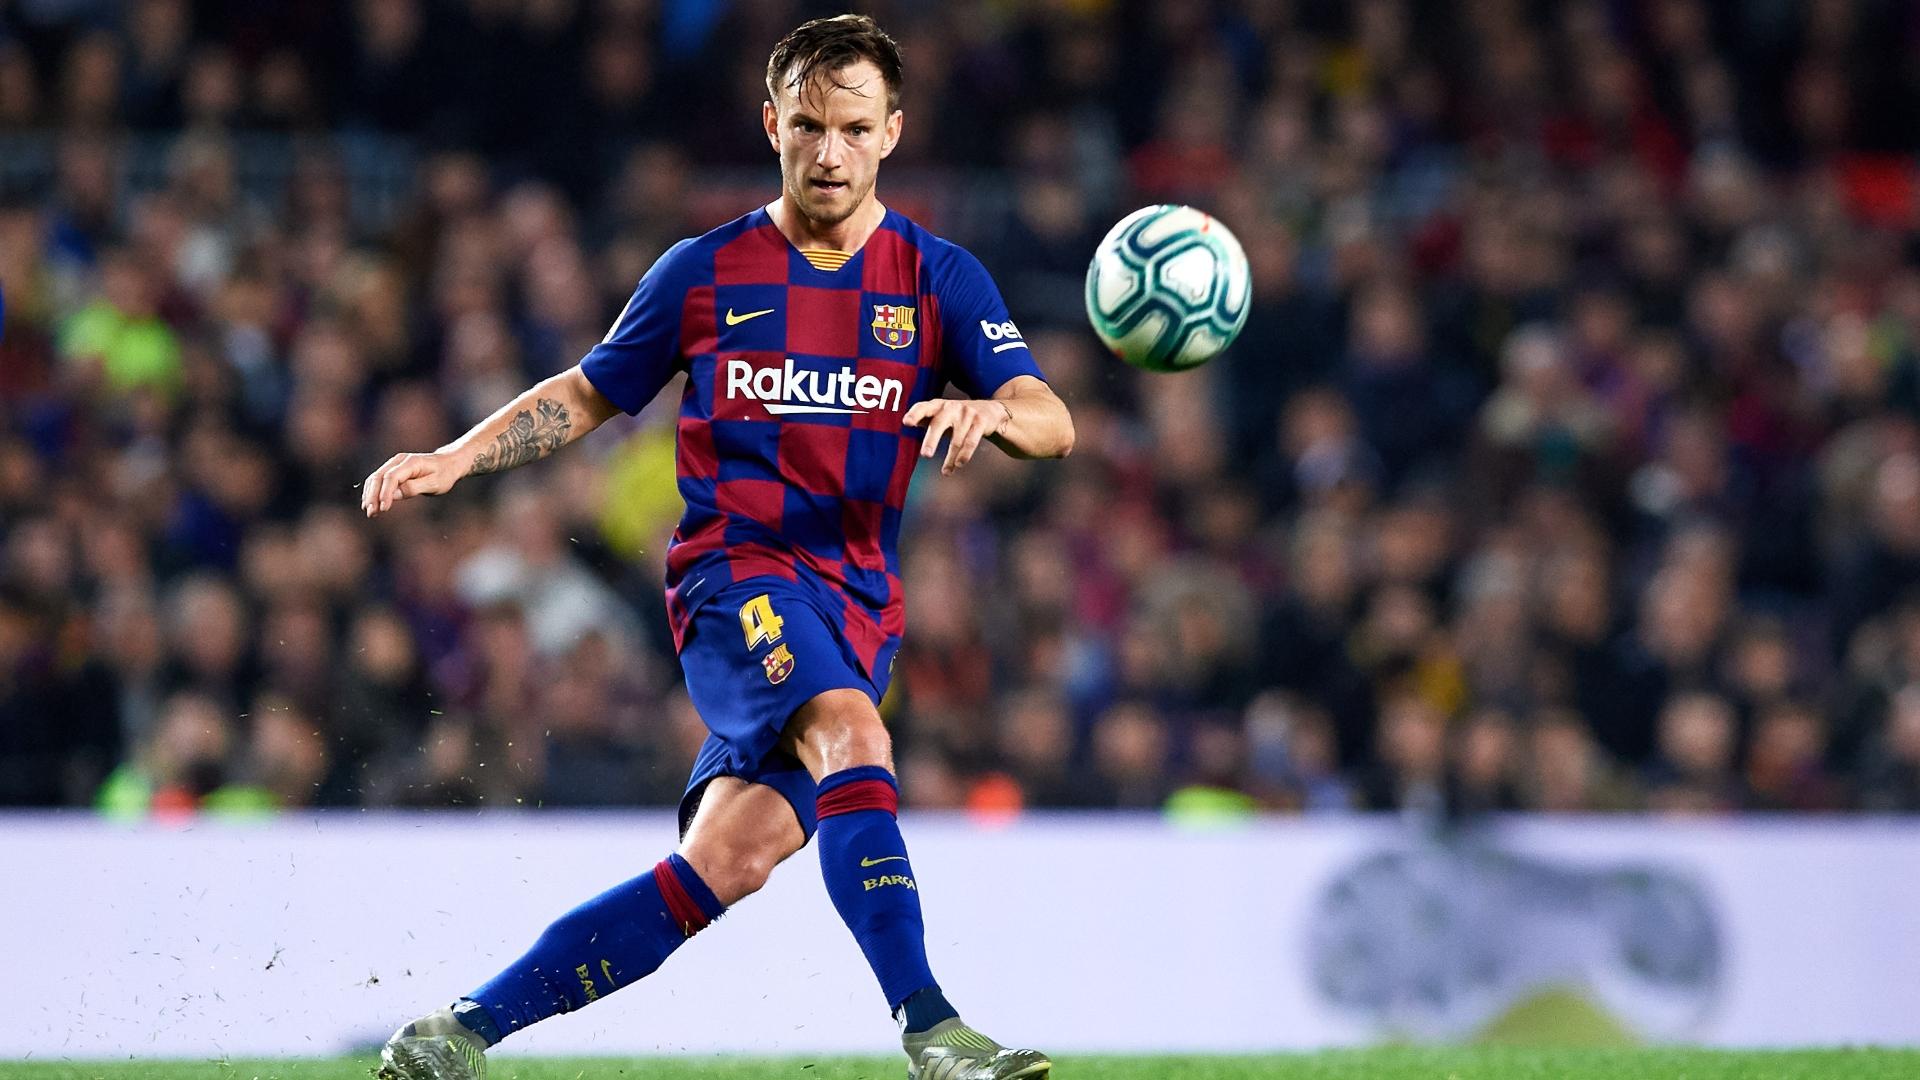 Barcelona set £17.6m asking price for long-term Man Utd target Ivan Rakitic   Read more: https://metro.co.uk/2020/04/02/barcelona-set-17-6m-asking-price-long-term-man-utd-target-ivan-rakitic-12501574/?ITO=squid&ito=newsnow-feed?ito=cbshare  Twitter: https://twitter.com/MetroUK   Facebook: https://www.facebook.com/MetroUK/ - Bóng Đá